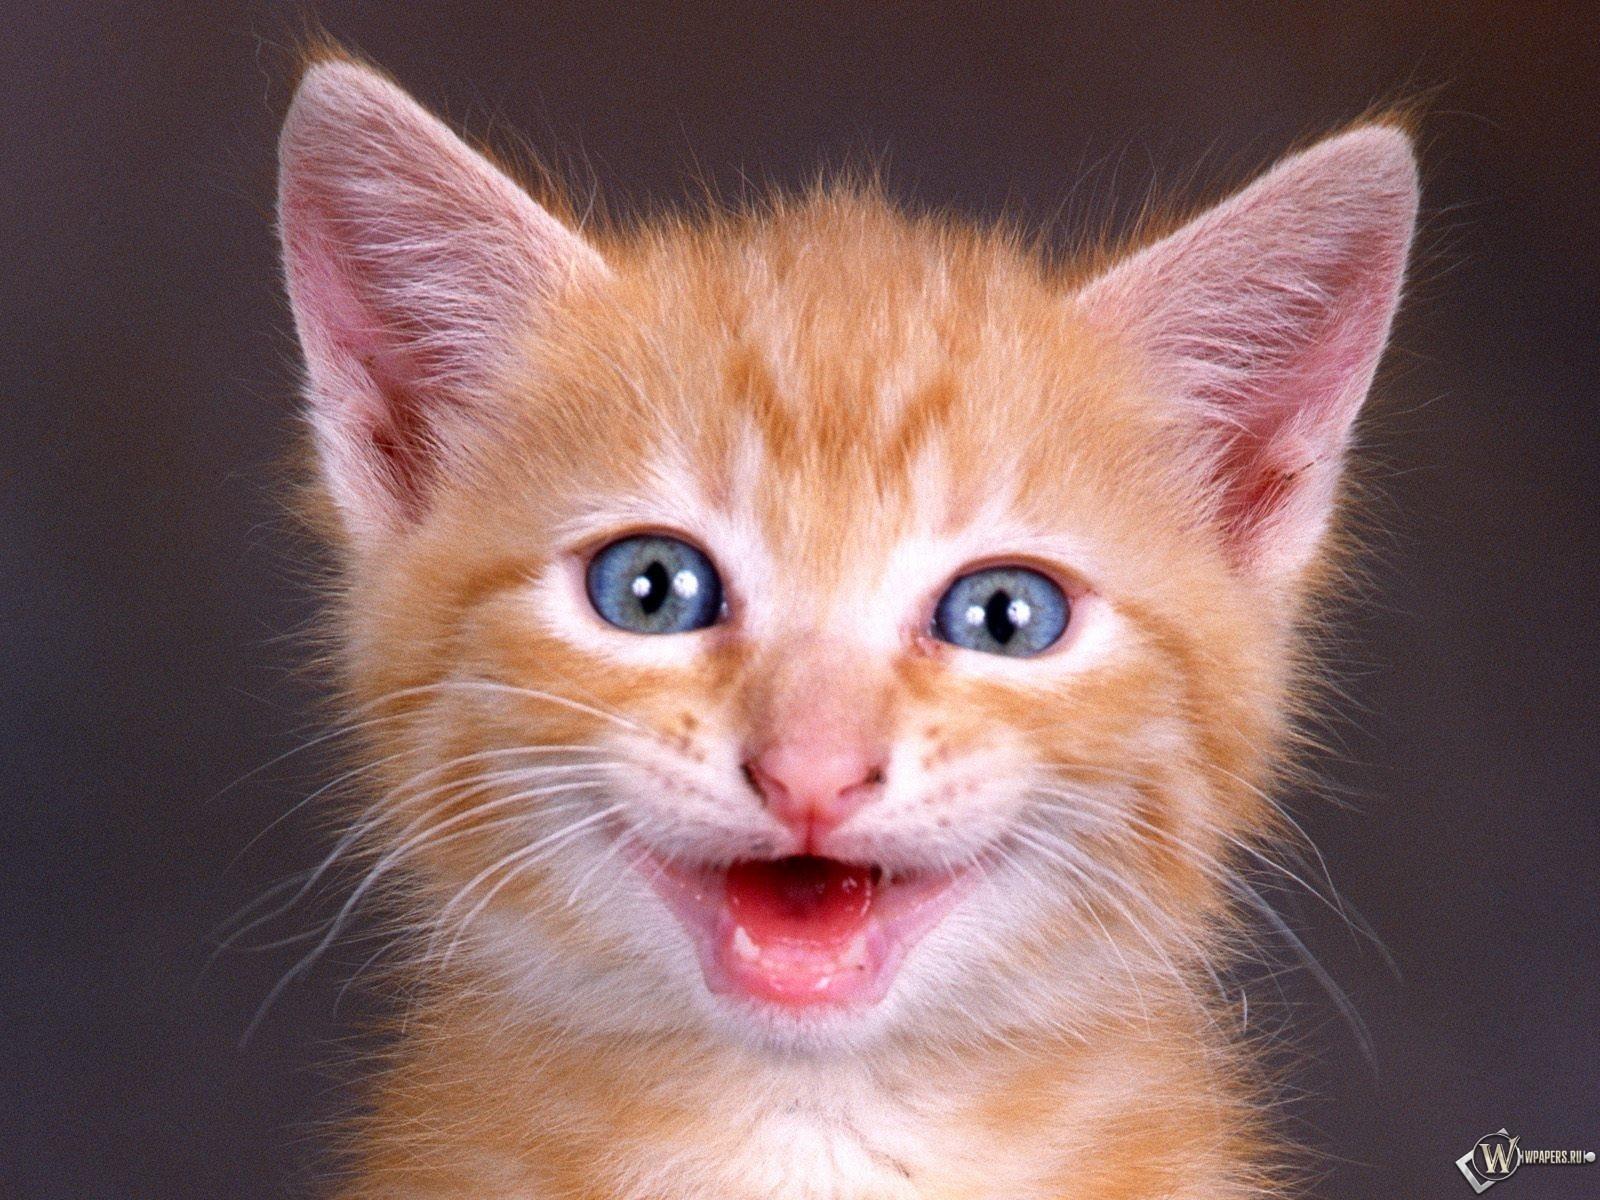 Смеющийся котенок 1600x1200